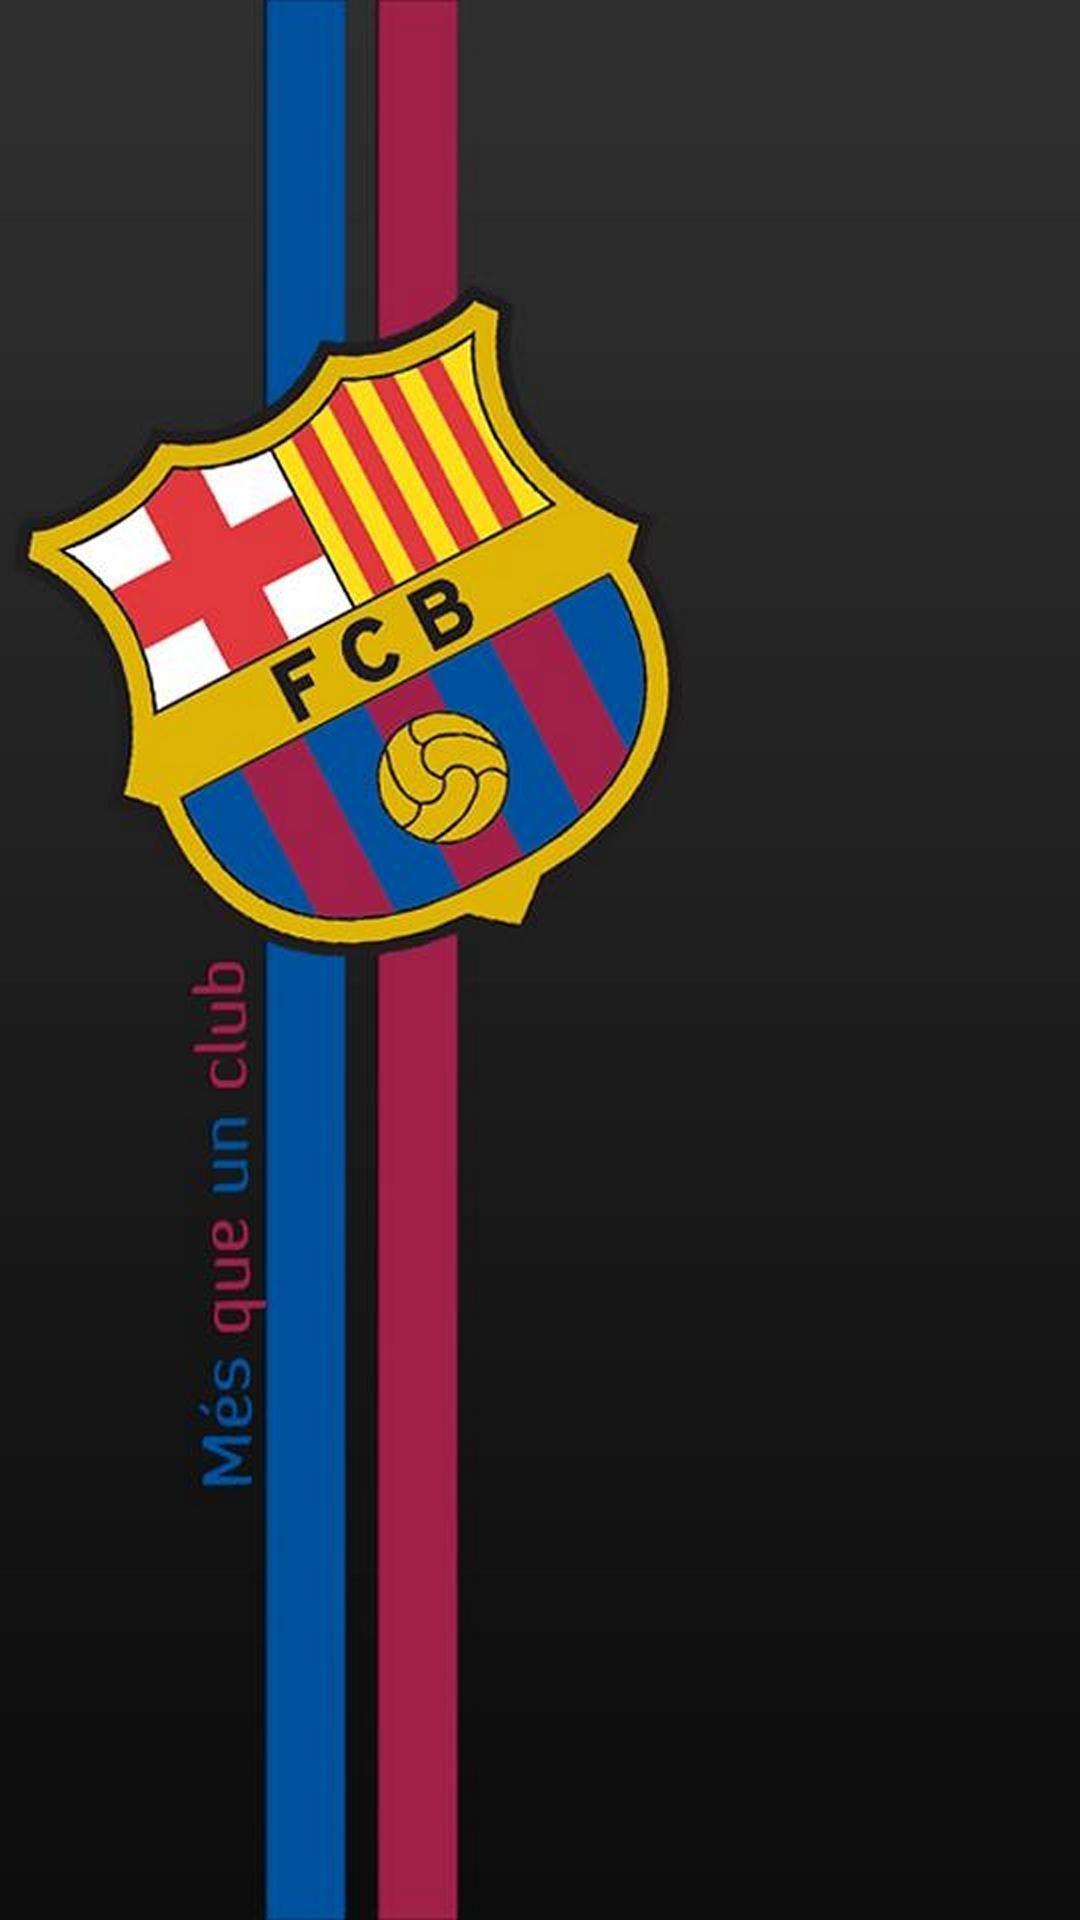 Lambang Barcelona : lambang, barcelona, Barcelona, Wallpapers, Backgrounds, WallpaperAccess